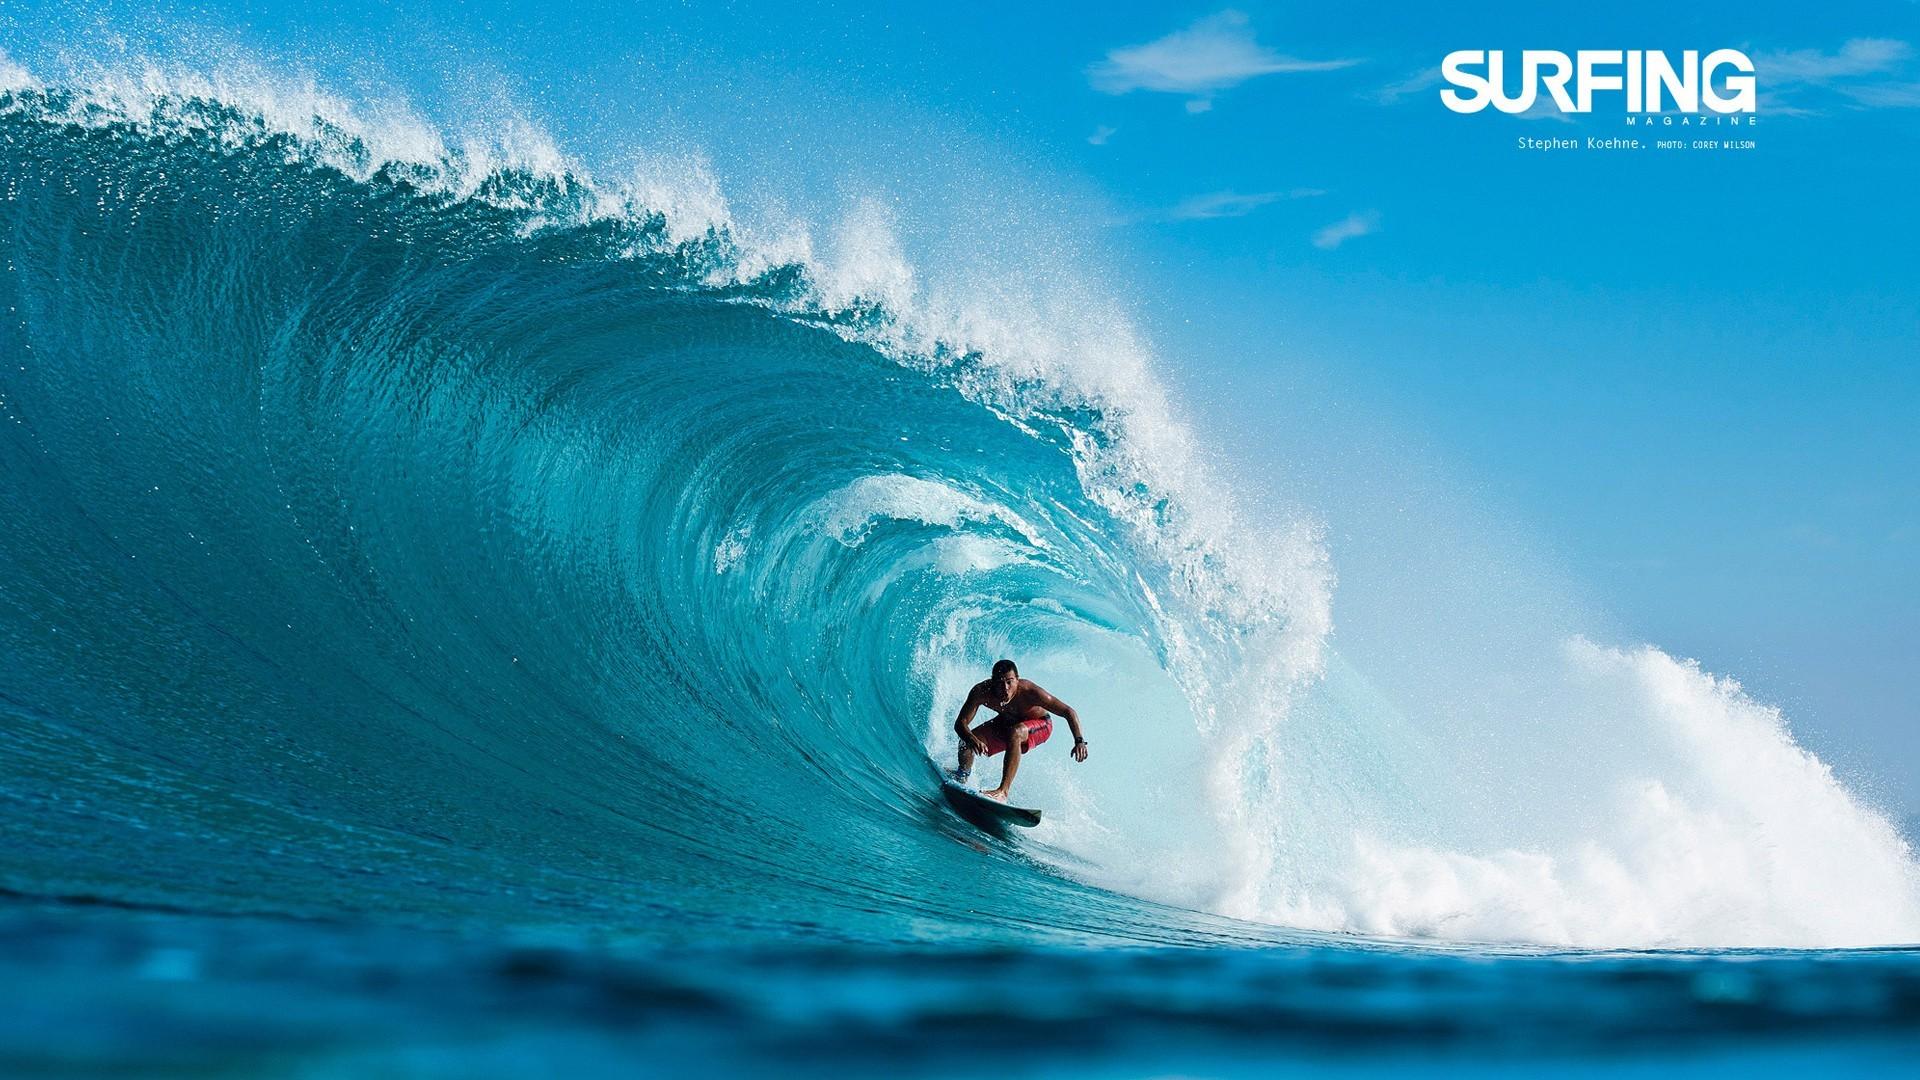 Res: 1920x1080, Surfing in Teahupoo Tahiti Wallpaper